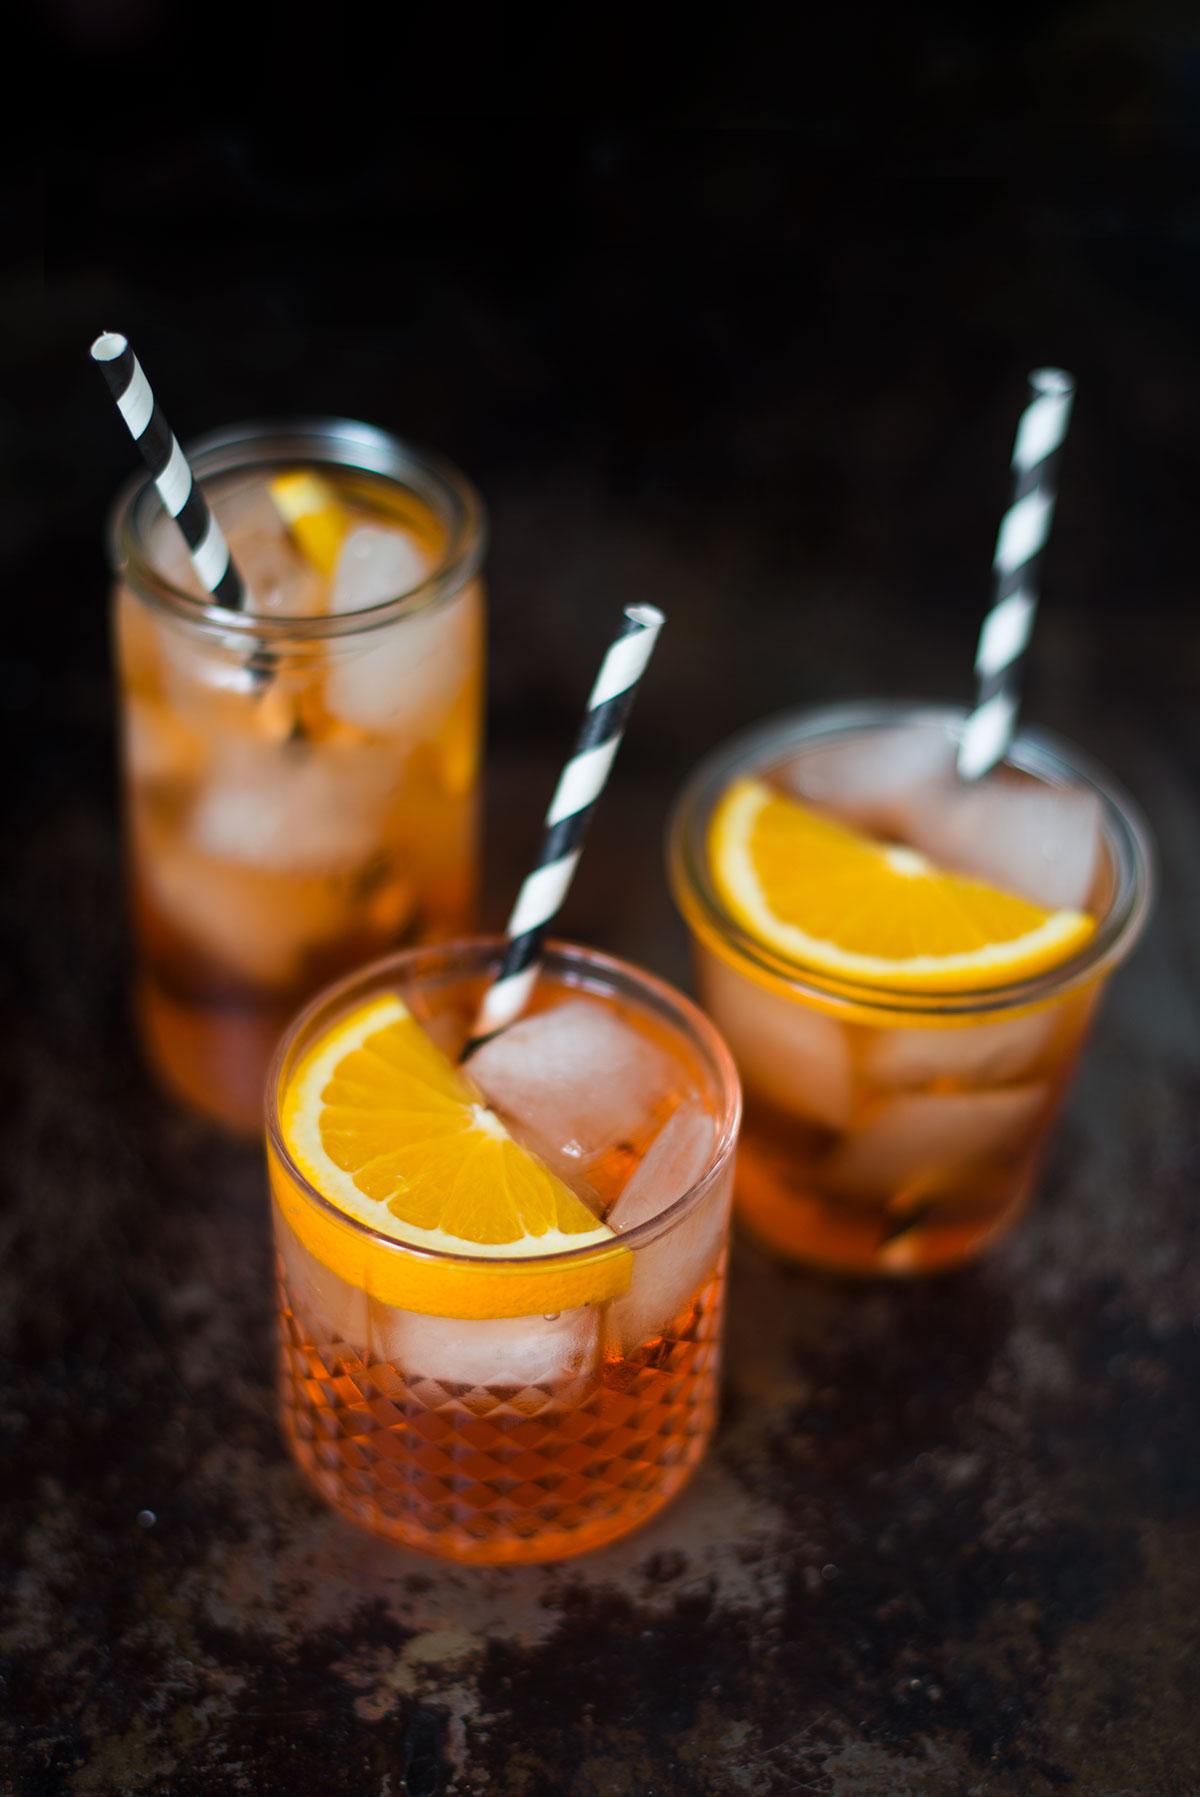 5 velkomstdrinks til nytår | Frk. Kræsen